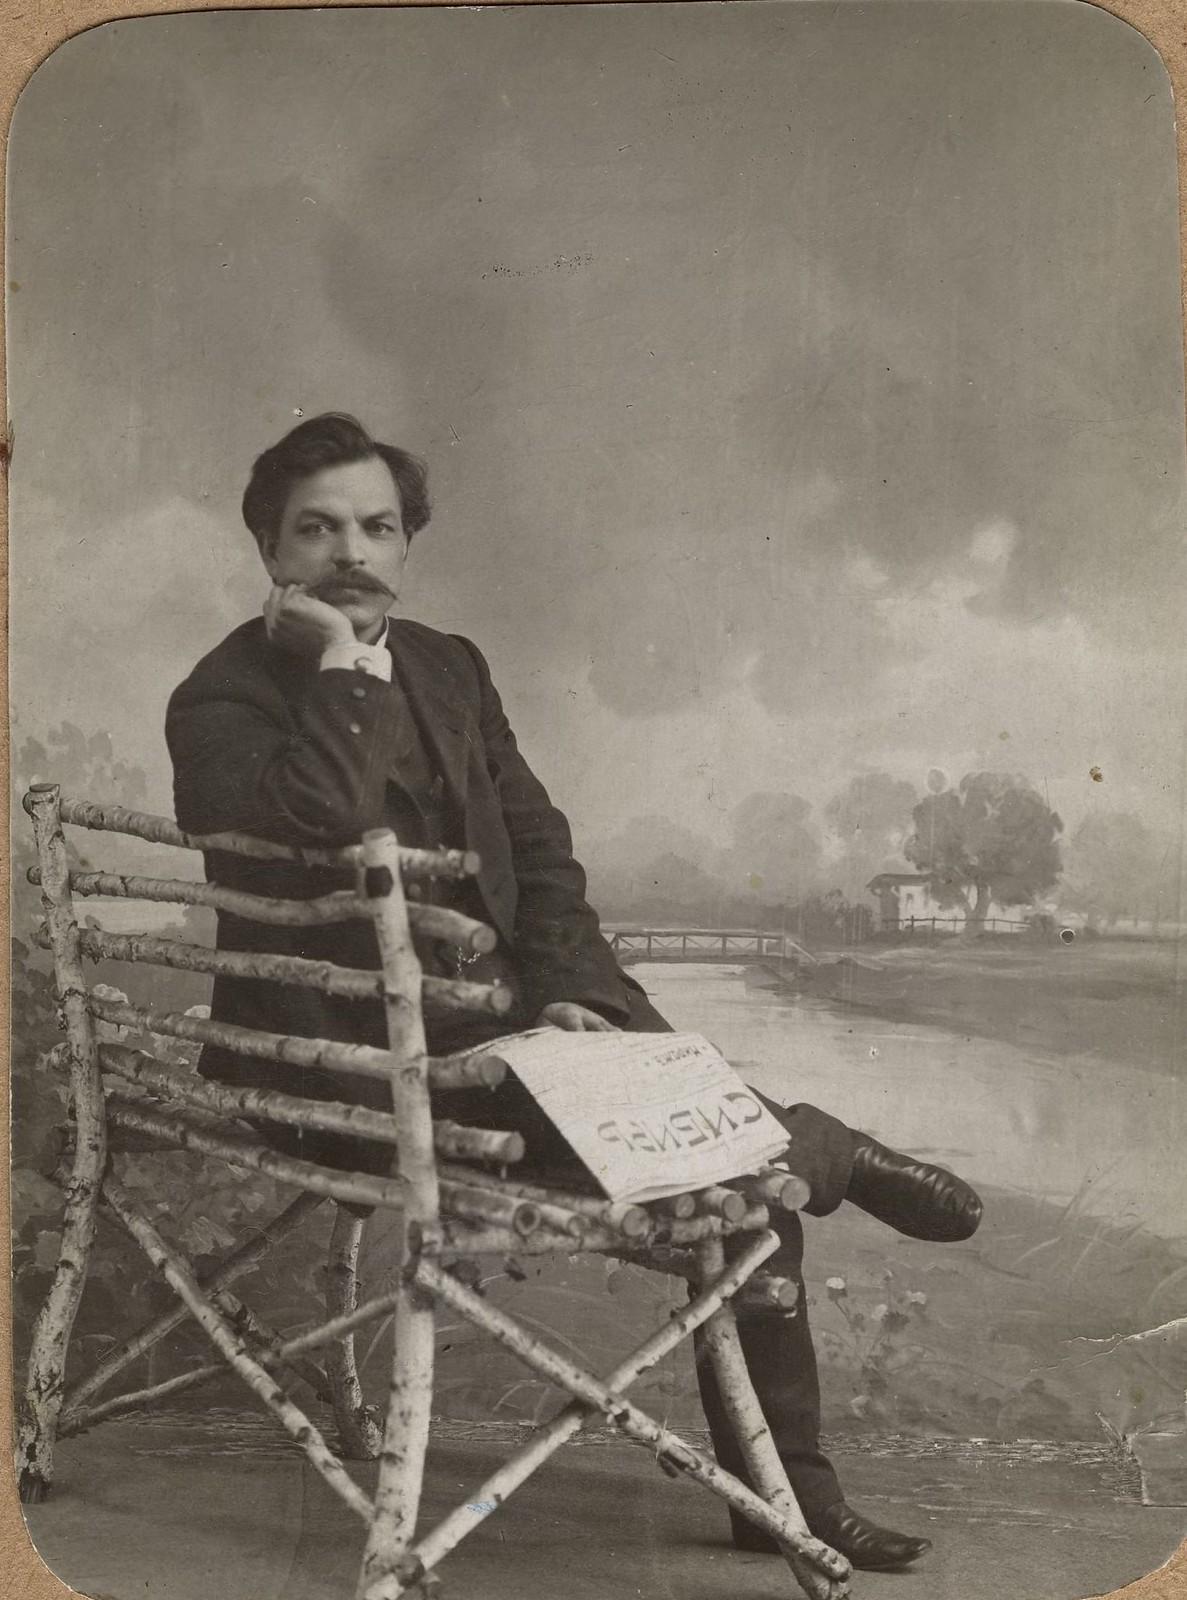 1900-е. Портрет Ф.Ф.Максимова с газетой «Сибирь» в руках